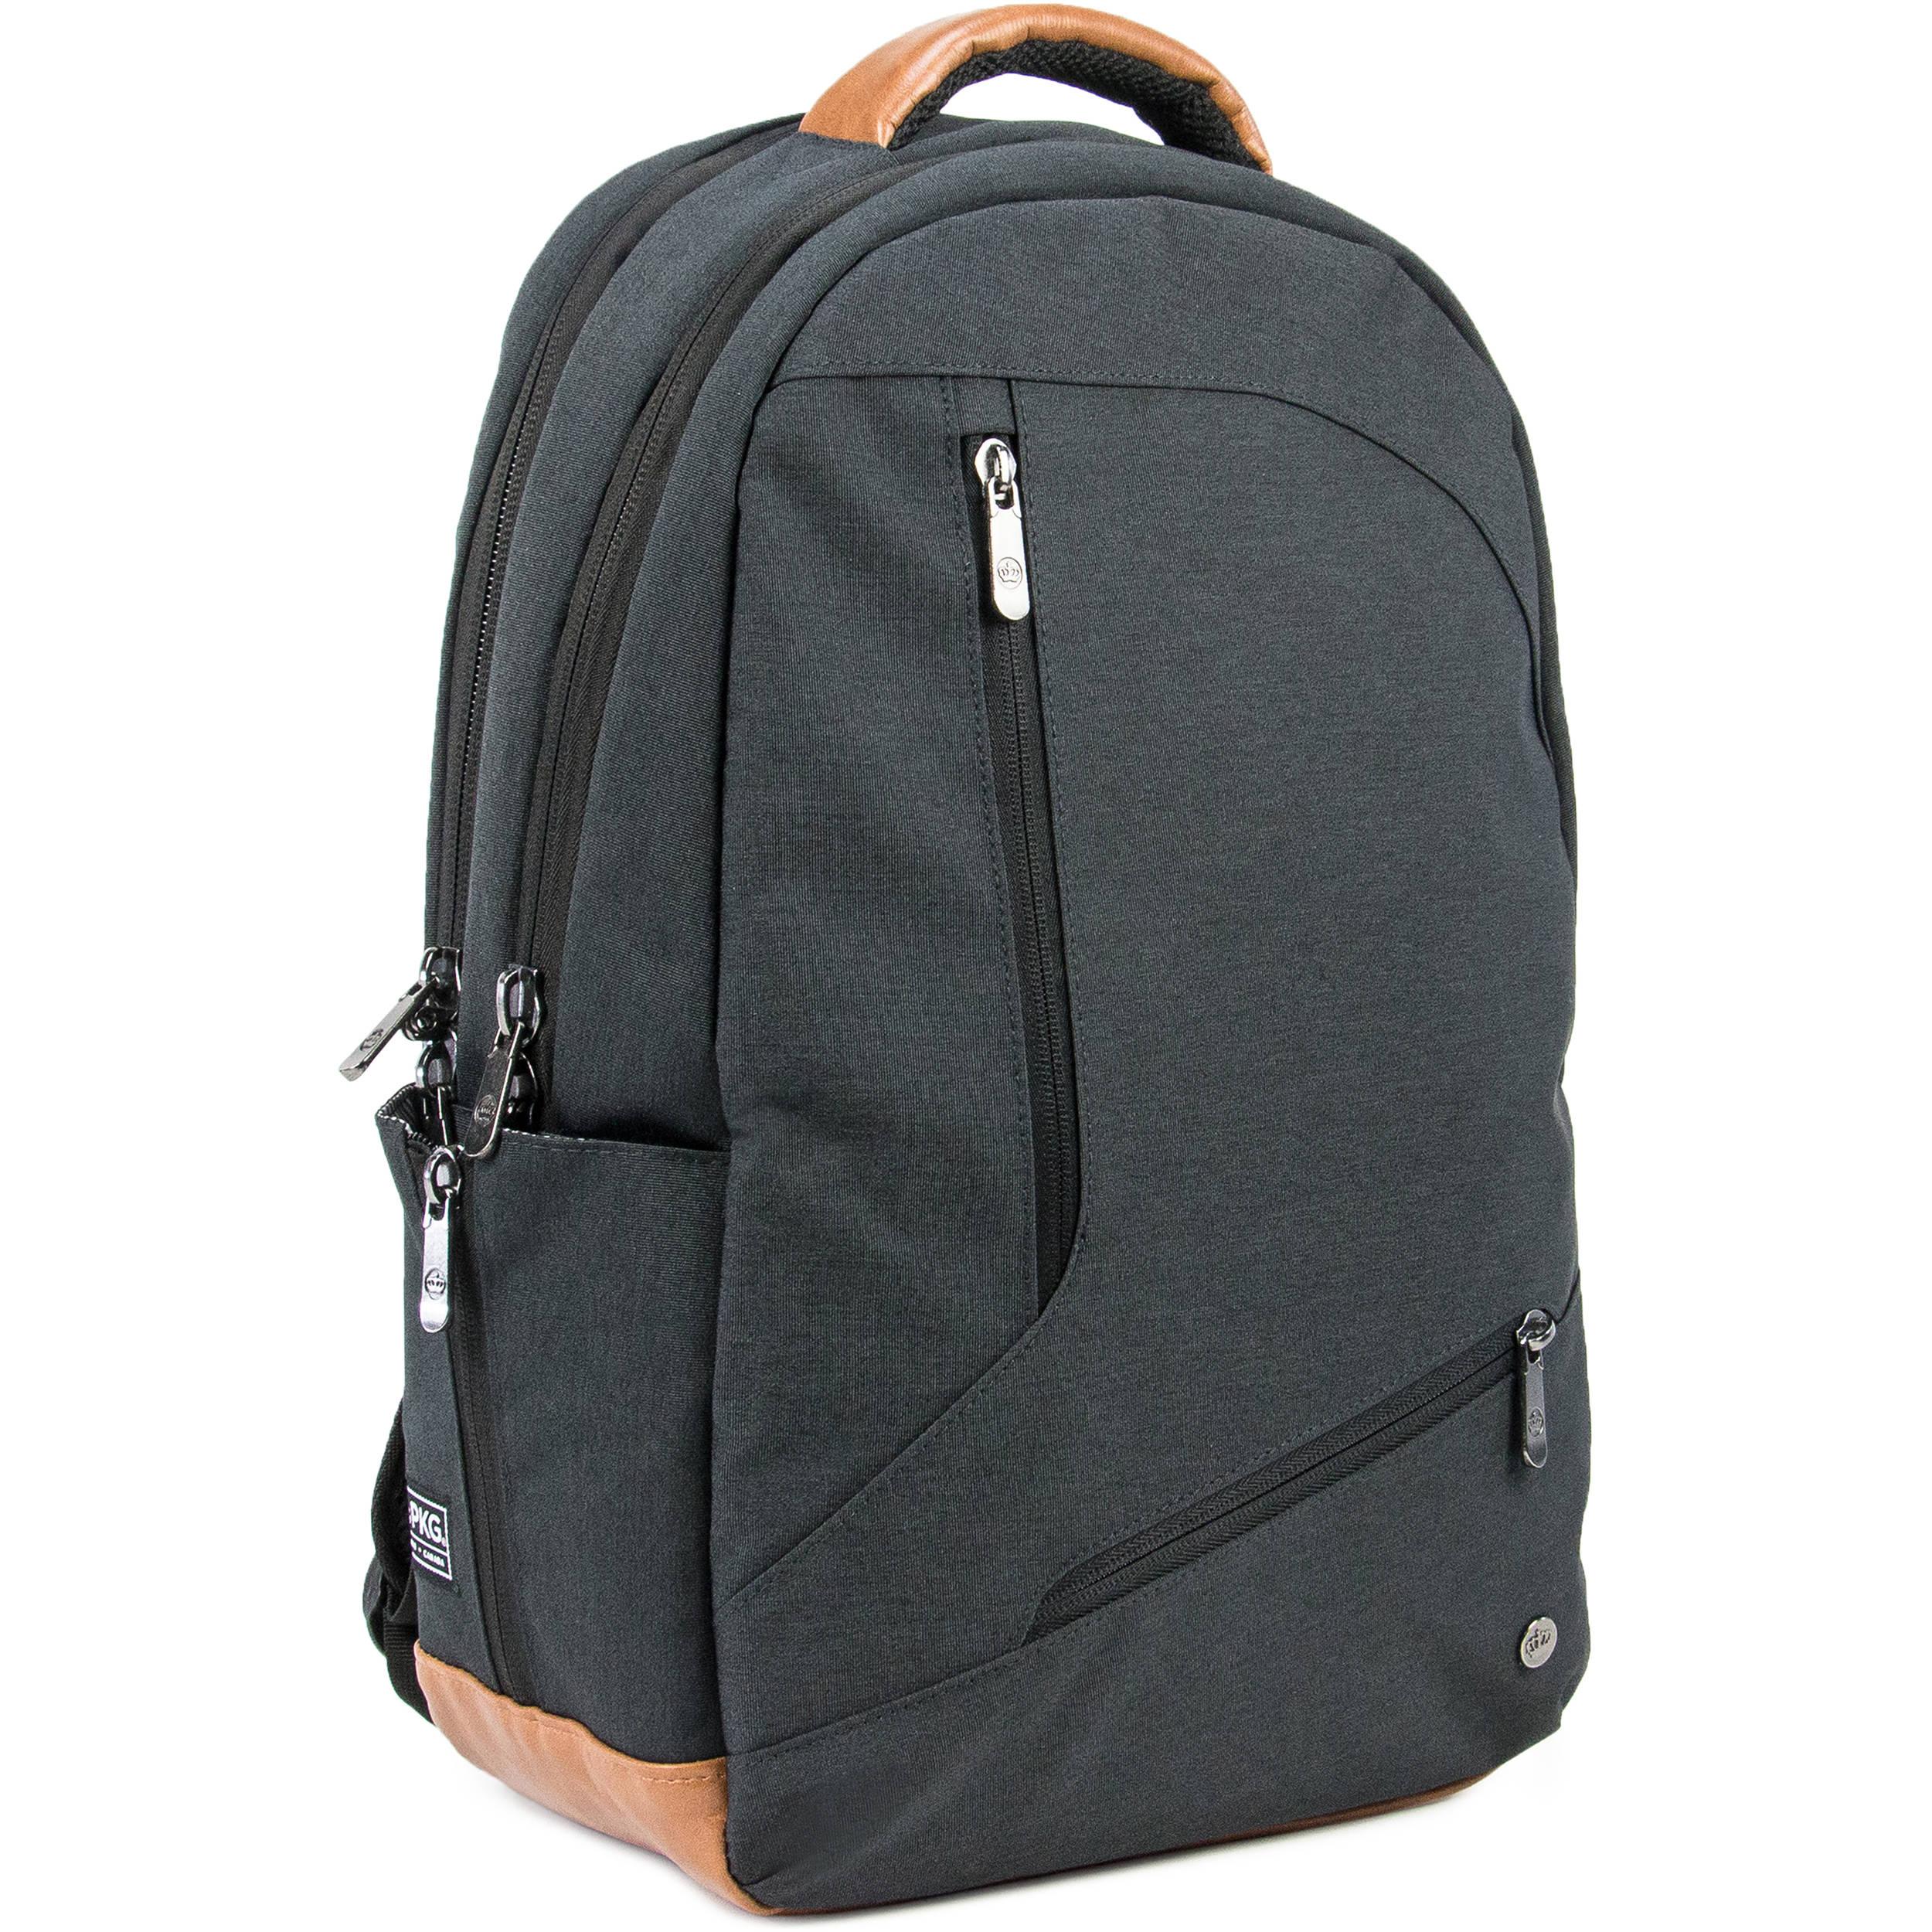 PKG International Durham High Volume Backpack (Dark Gray)